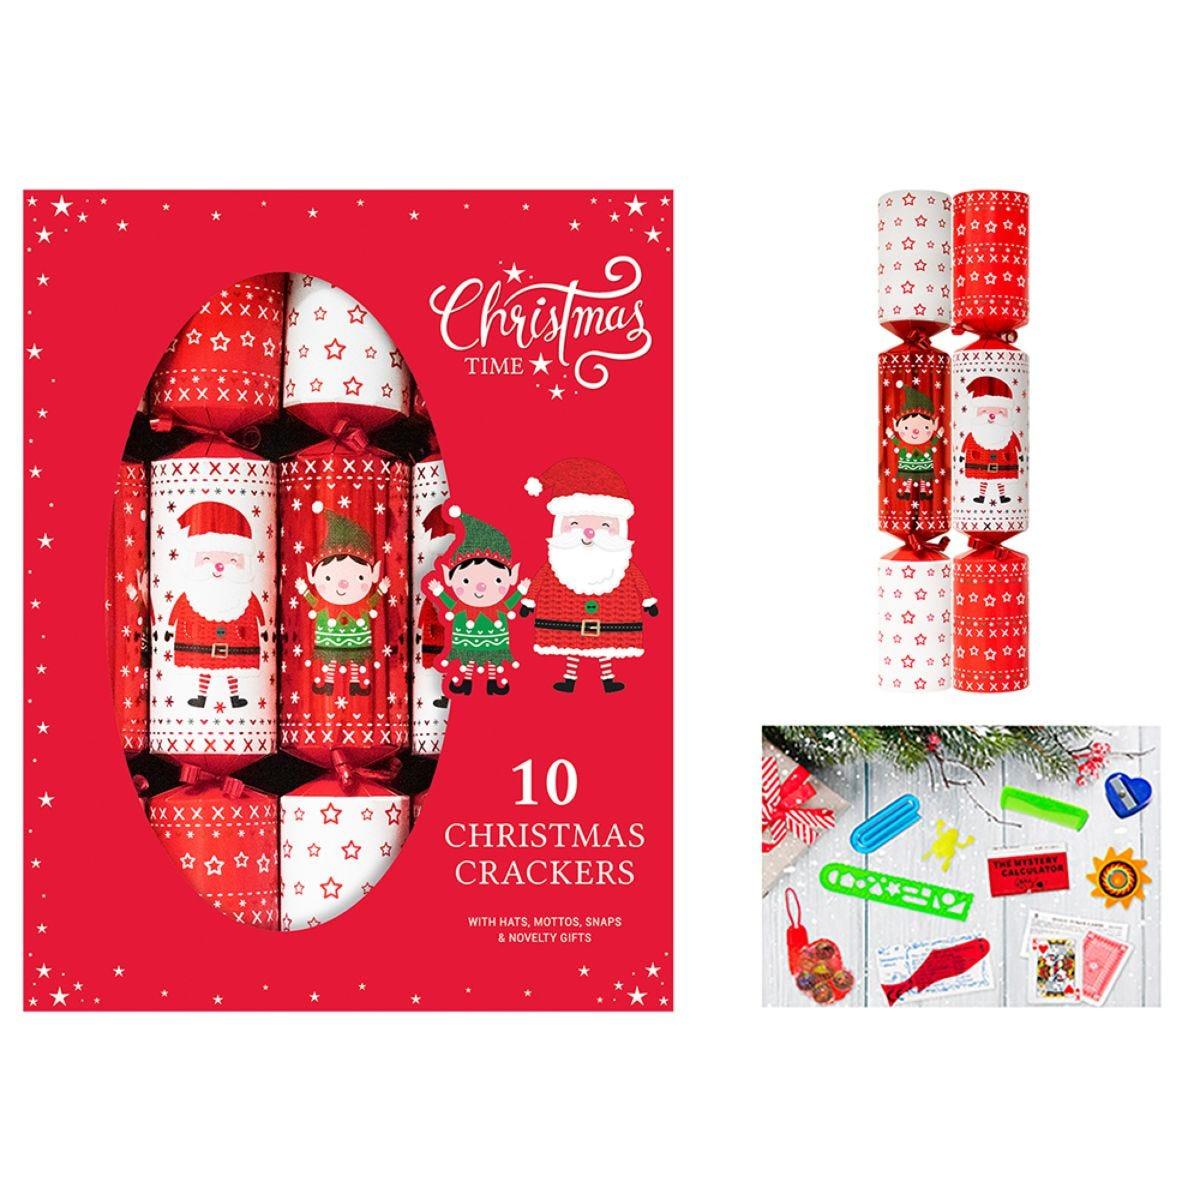 Santa & Elf Set of 10 Christmas Crackers - Red & White